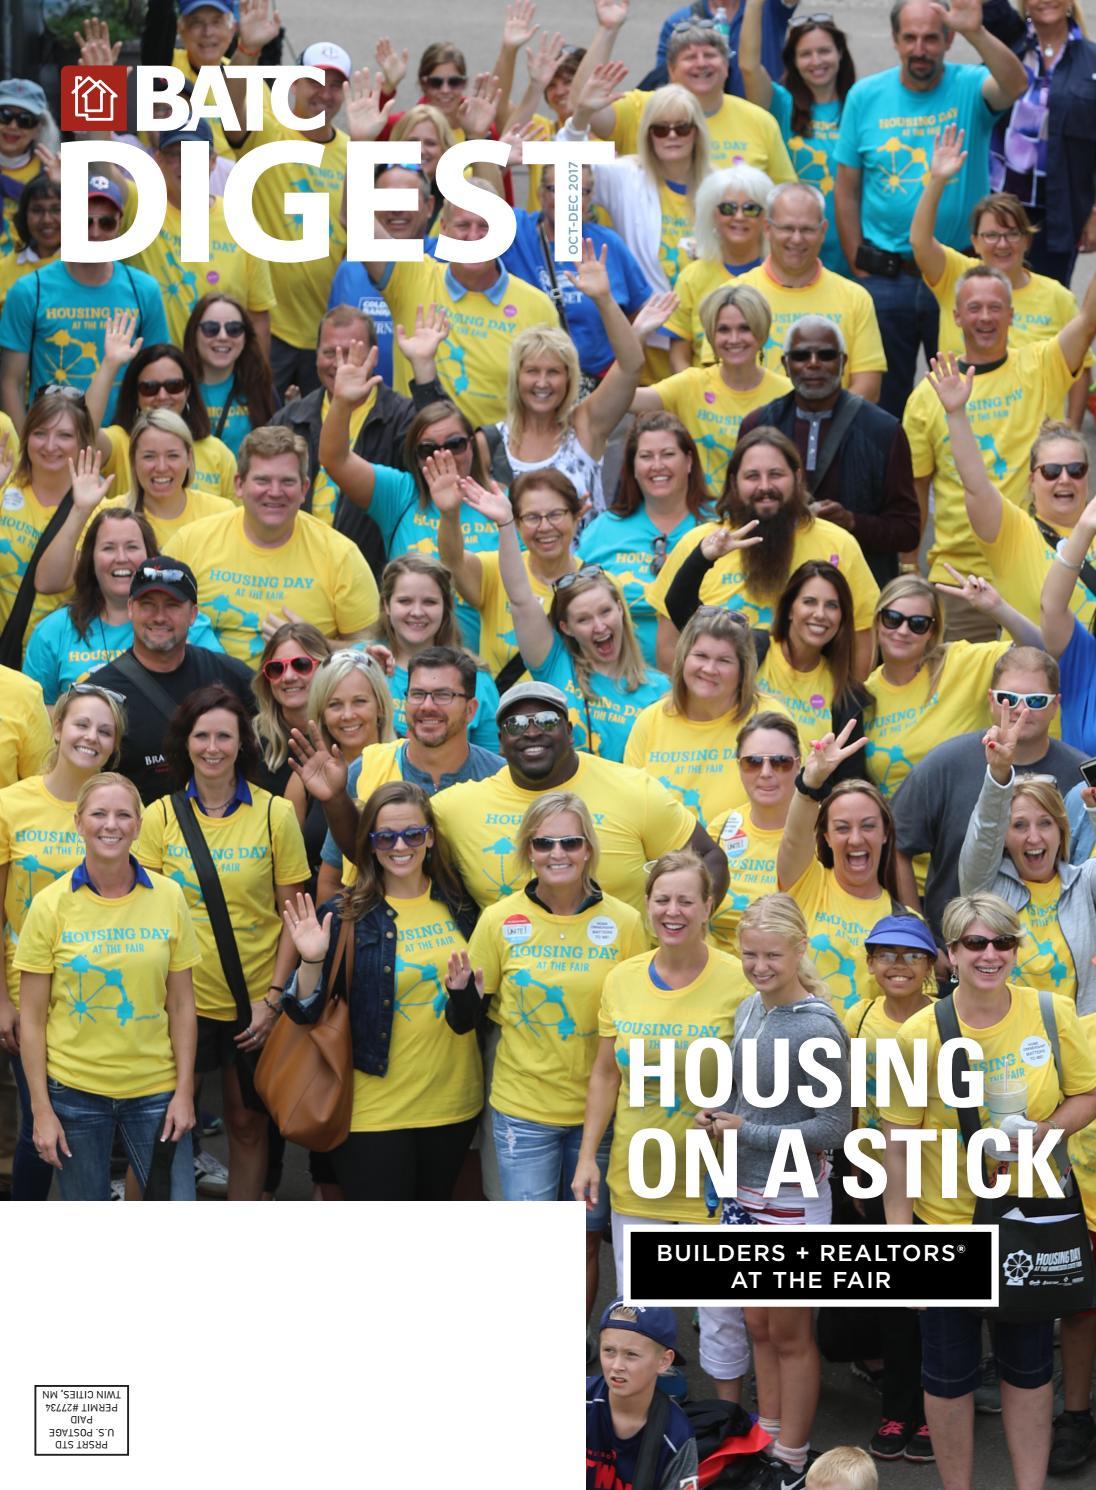 BATC Digest | Oct–Dec 2017 by Housing First Minnesota - Issuu